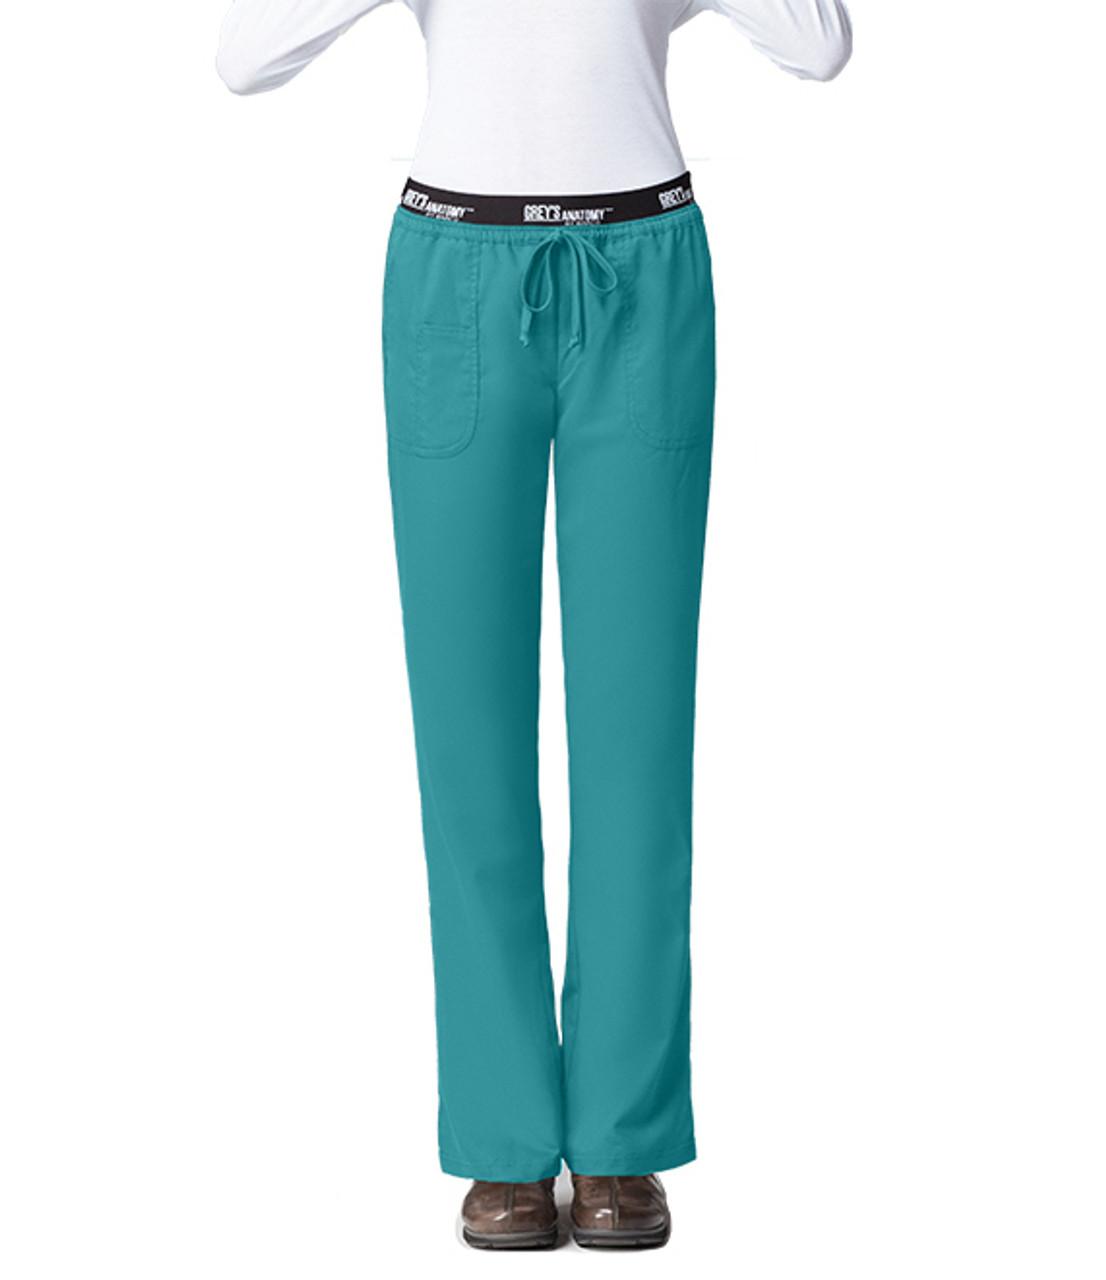 0f81cfcde0a (4275) Grey's Anatomy Active Scrubs - 3 Pocket Logo Elastic Waist Scrub  Pants ...